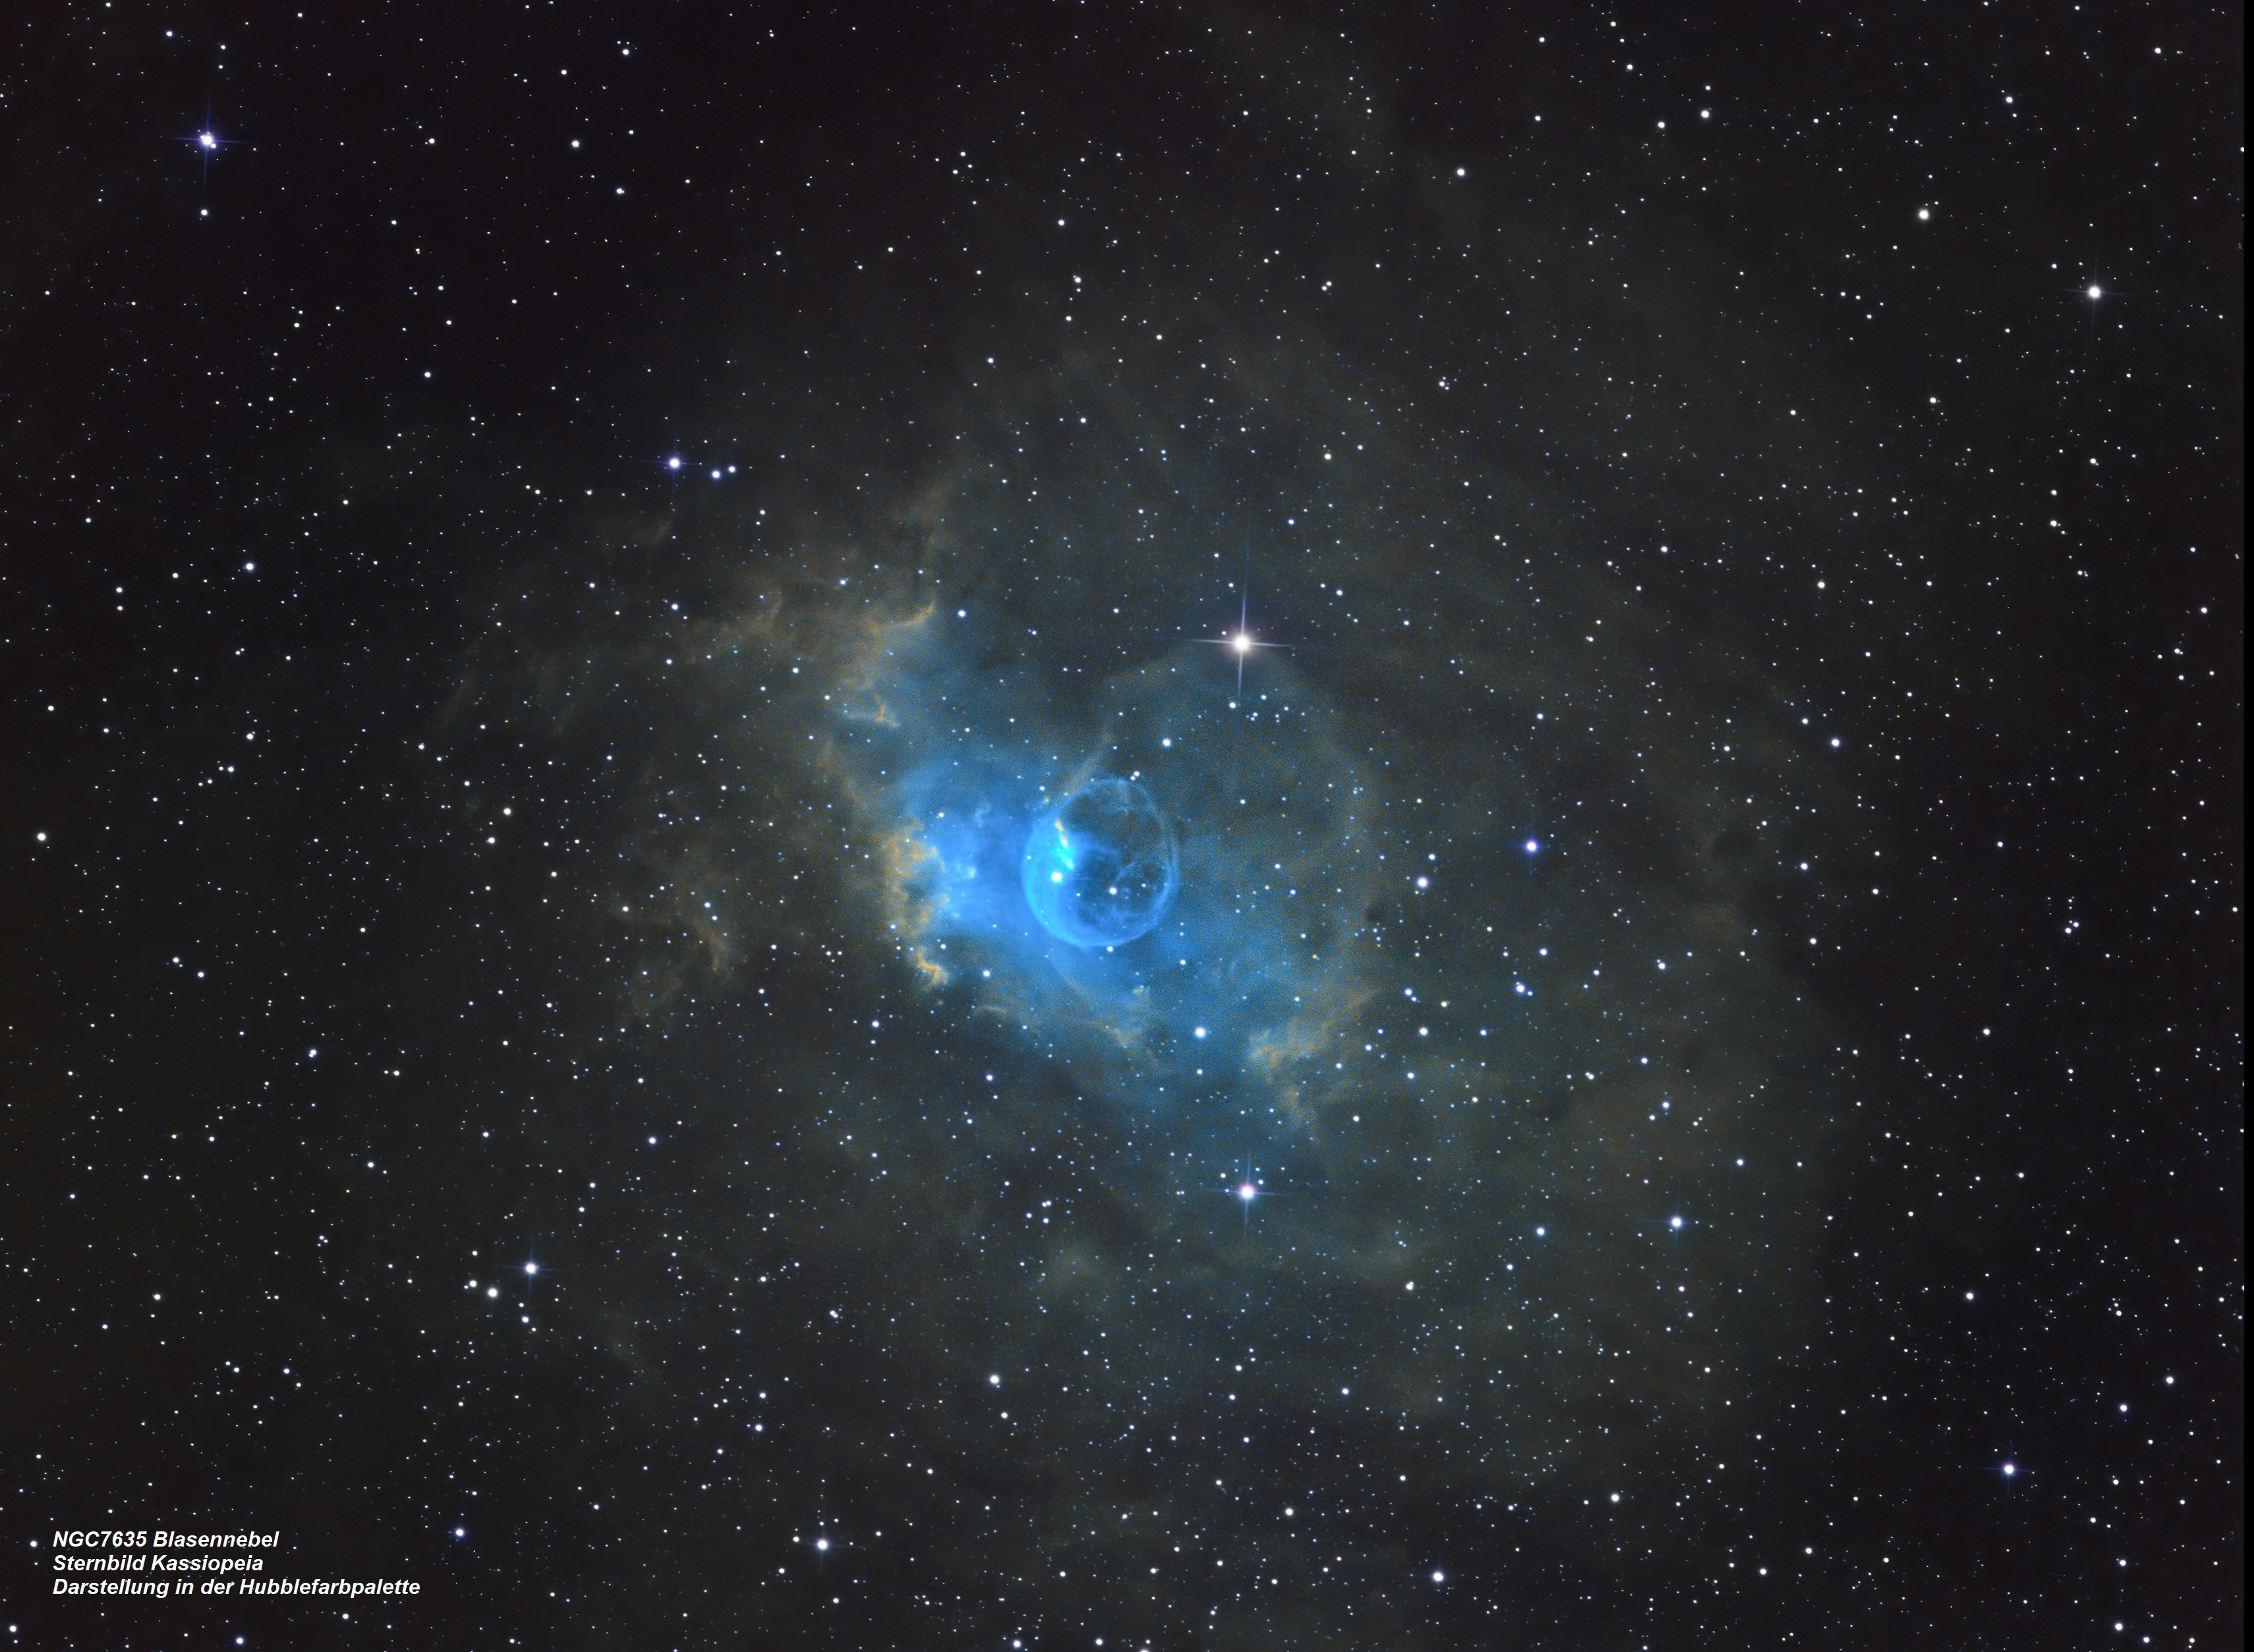 NGC7635 Blasennebel (Hubble-Farbpalette)